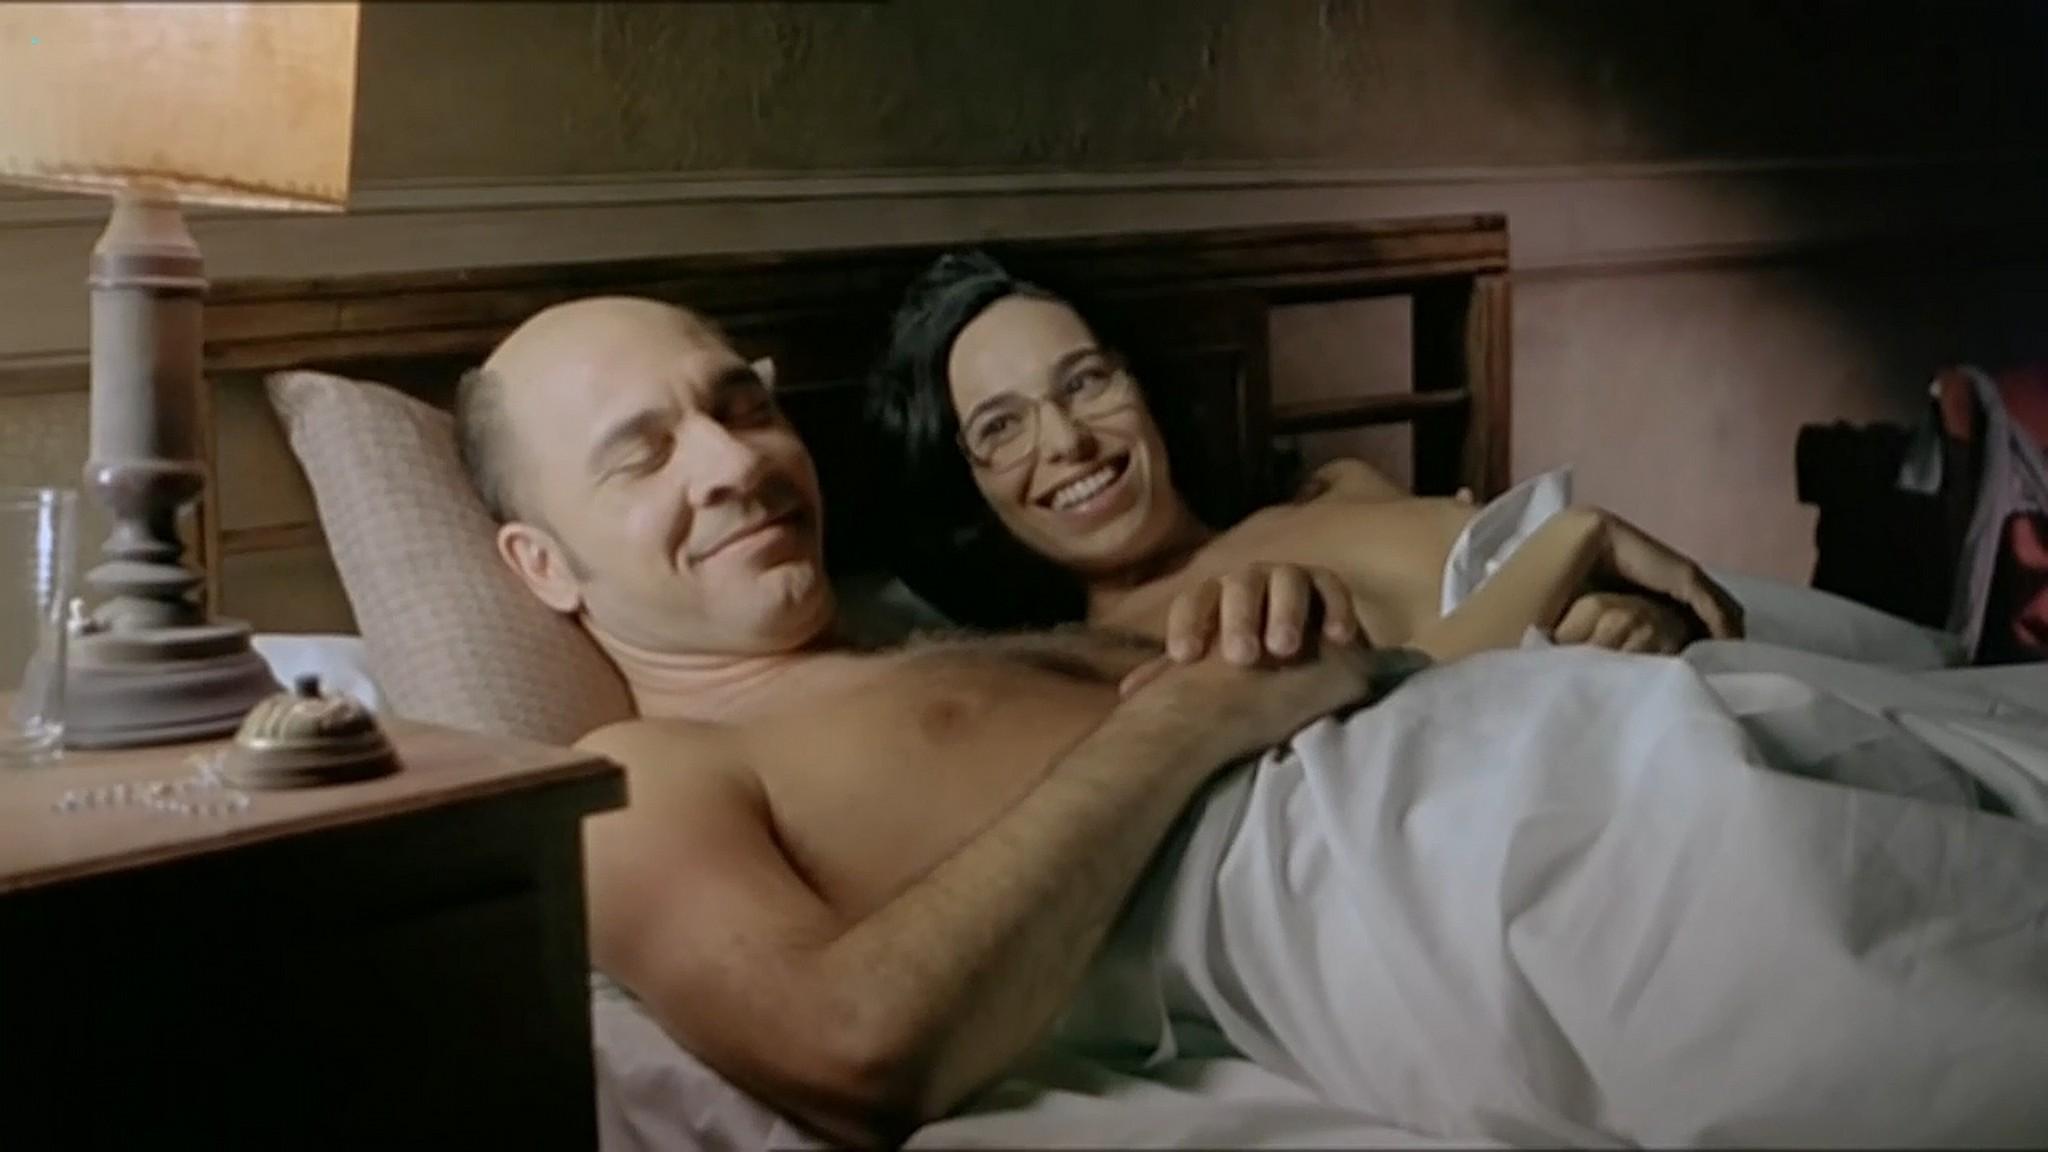 Ariadna Gil nude sex Sandra Ballesteros and other nude and sex El lado oscuro del corazon 2 AR 2001 720p 3